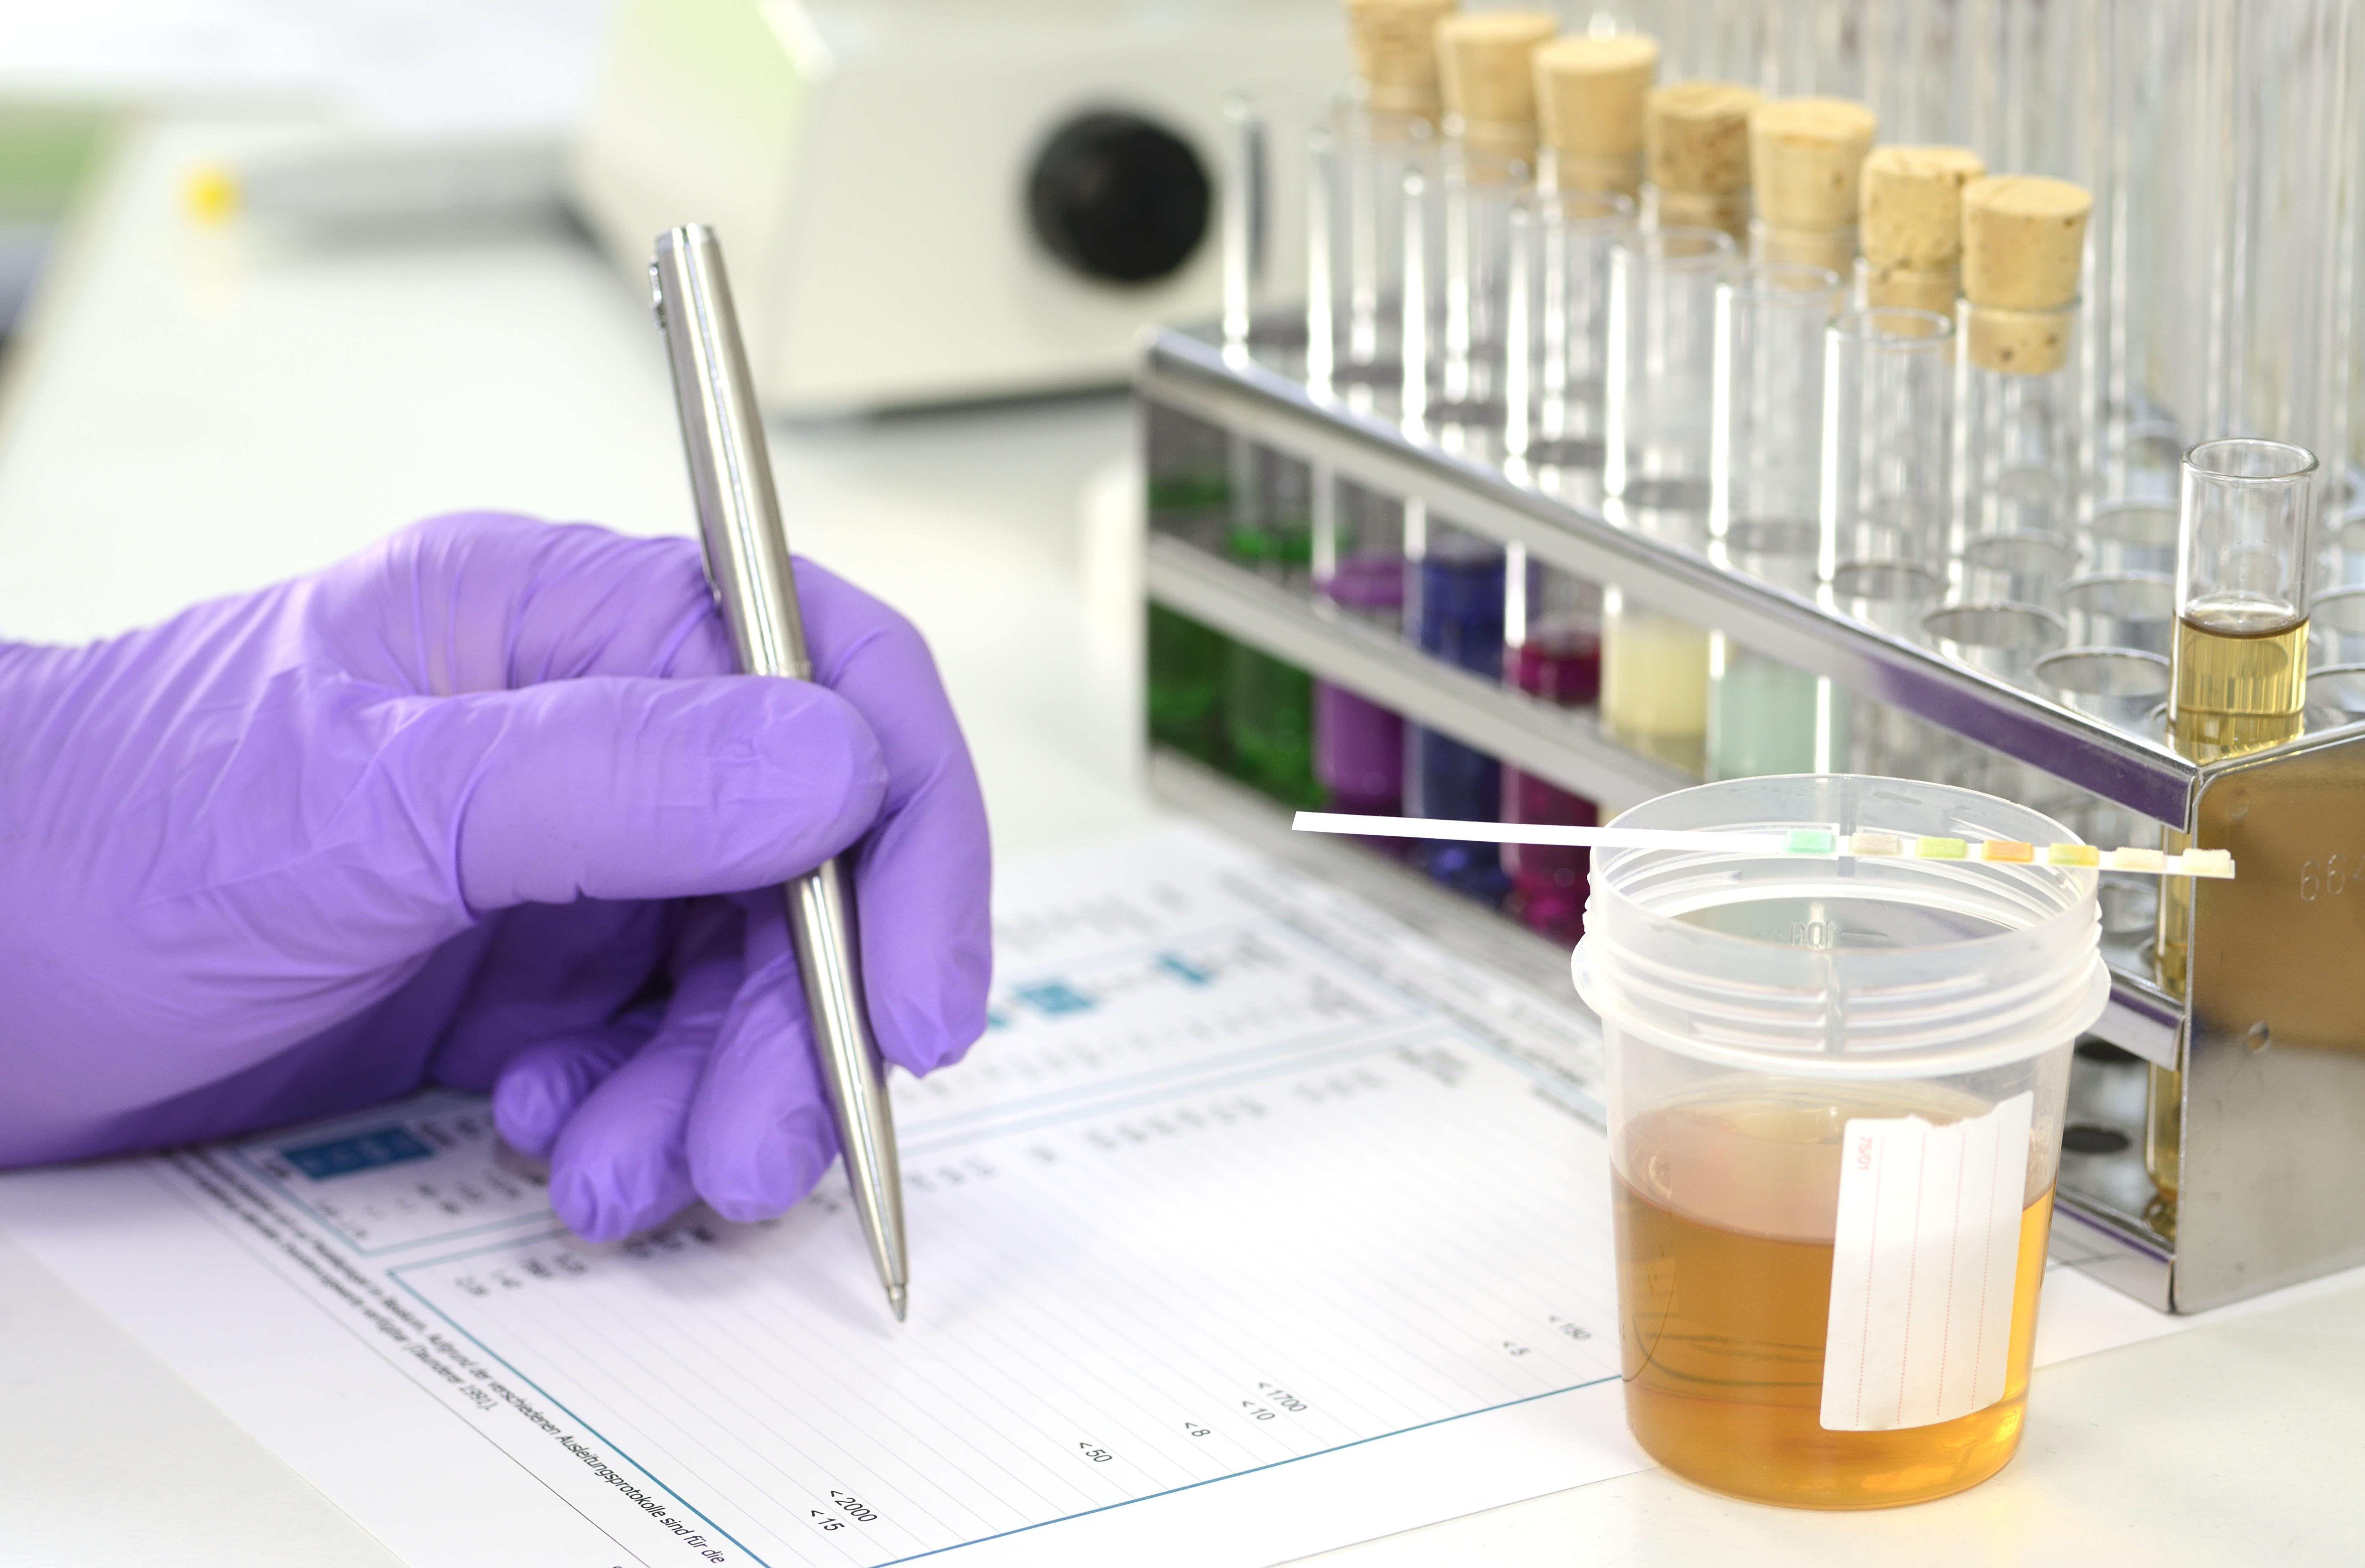 random drug testing, drug test, drug testing, drug screening